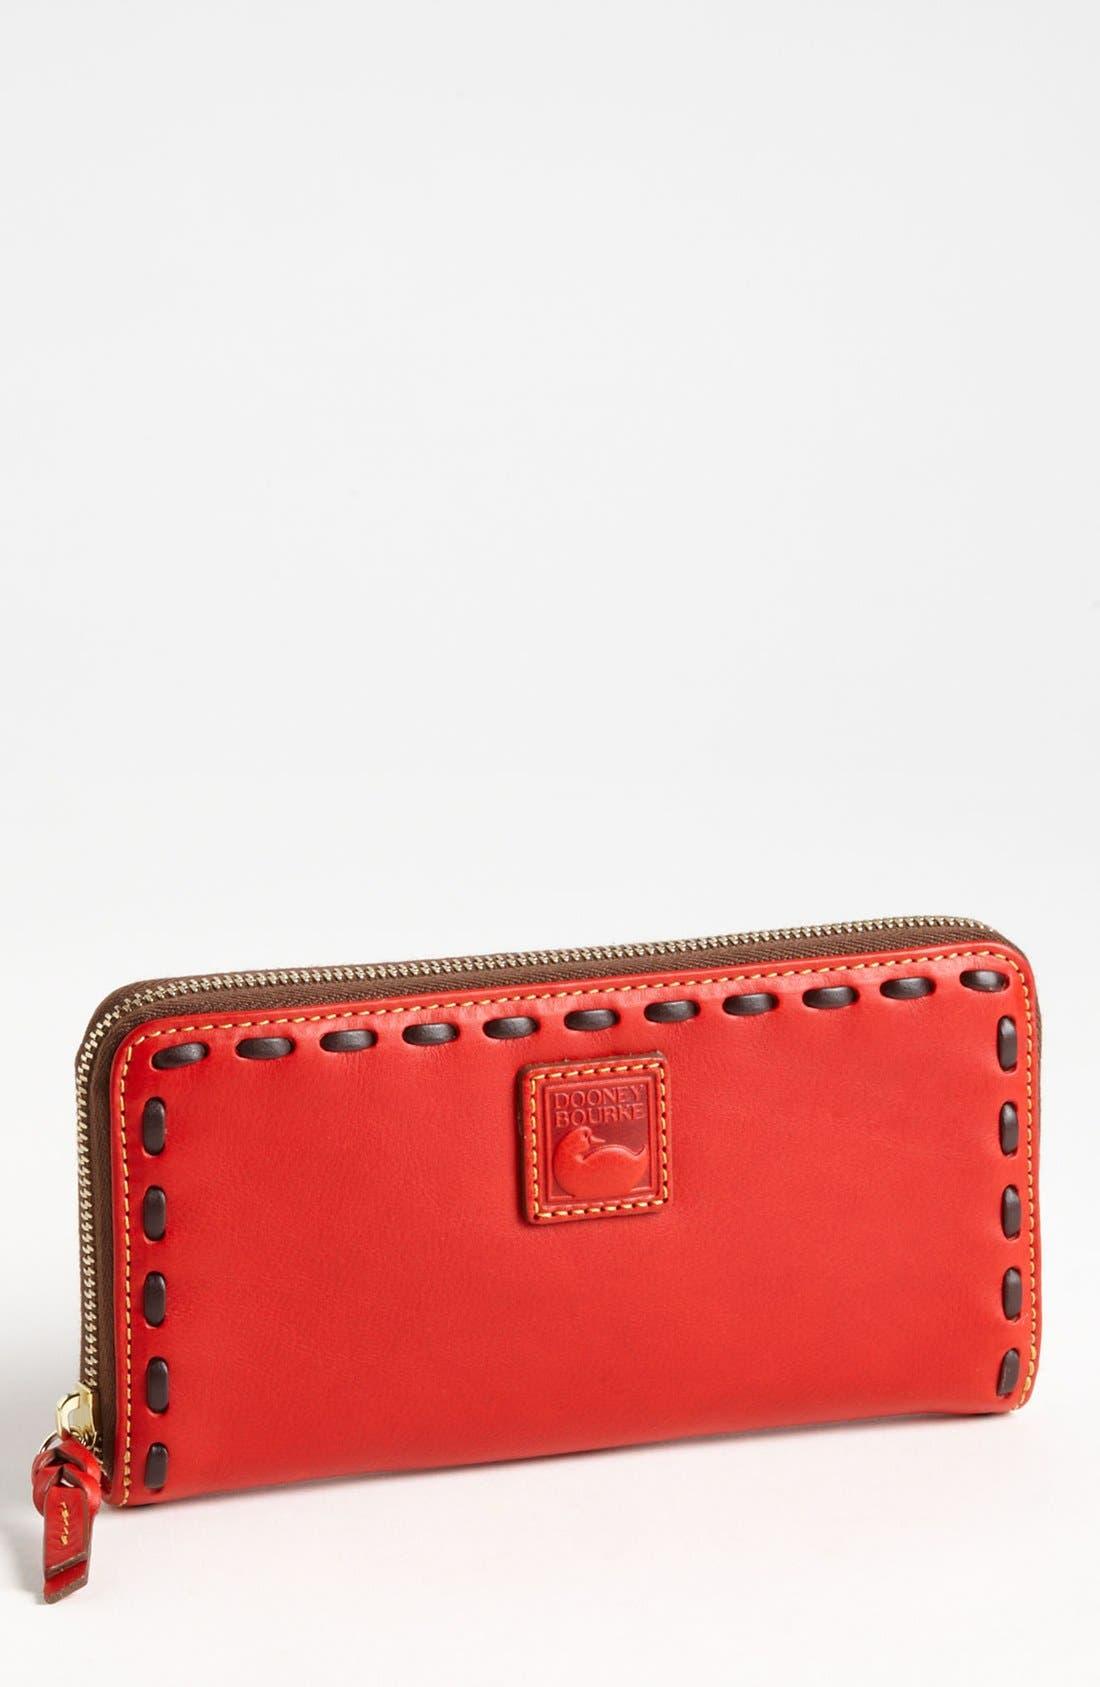 Alternate Image 1 Selected - Dooney & Bourke 'Florentine - Large' Zip Around Wallet